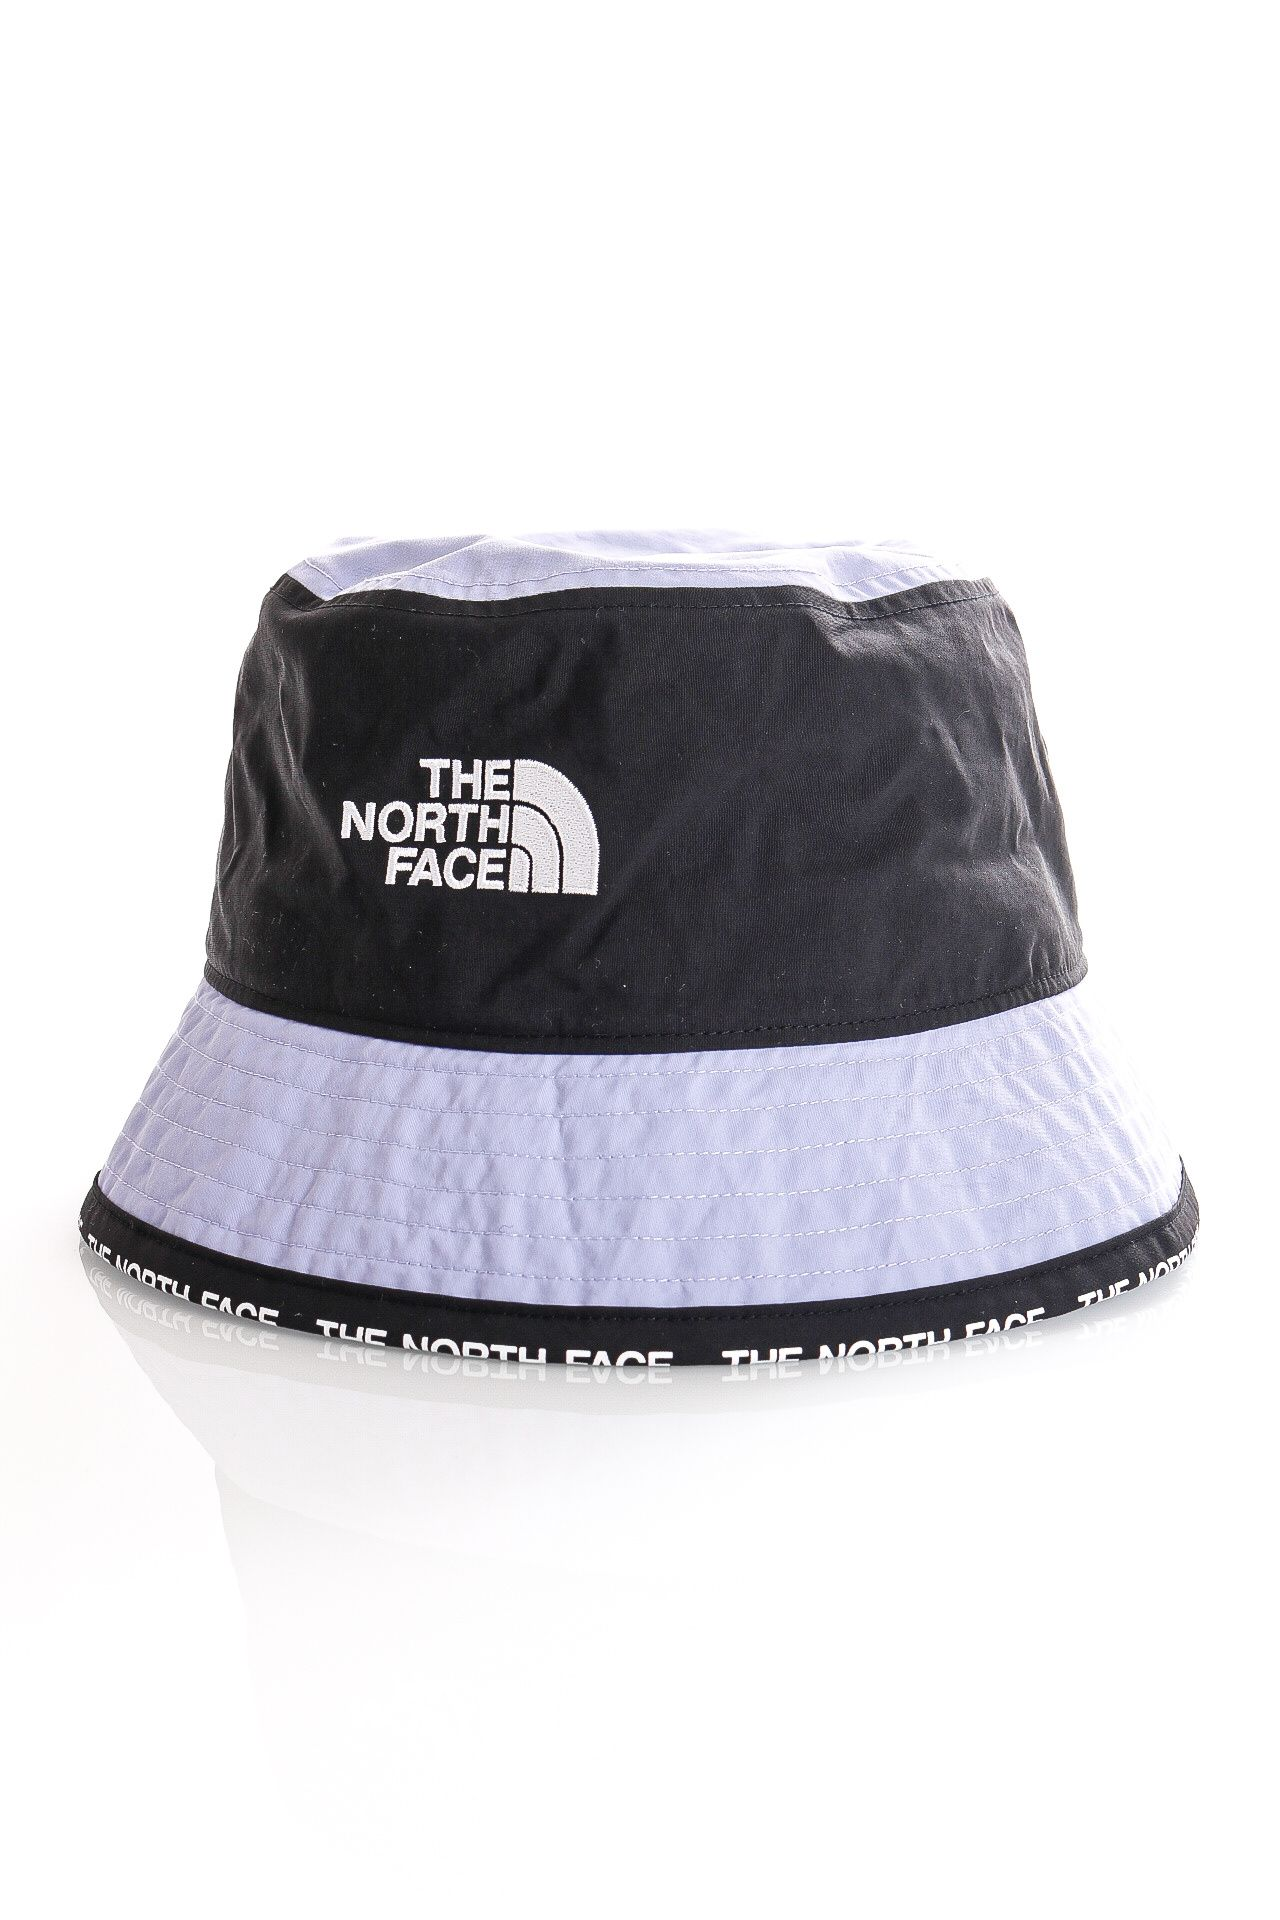 Afbeelding van The North Face Bucket Hat Cypress Bucket Sweet Lavender NF0A3VVKW231